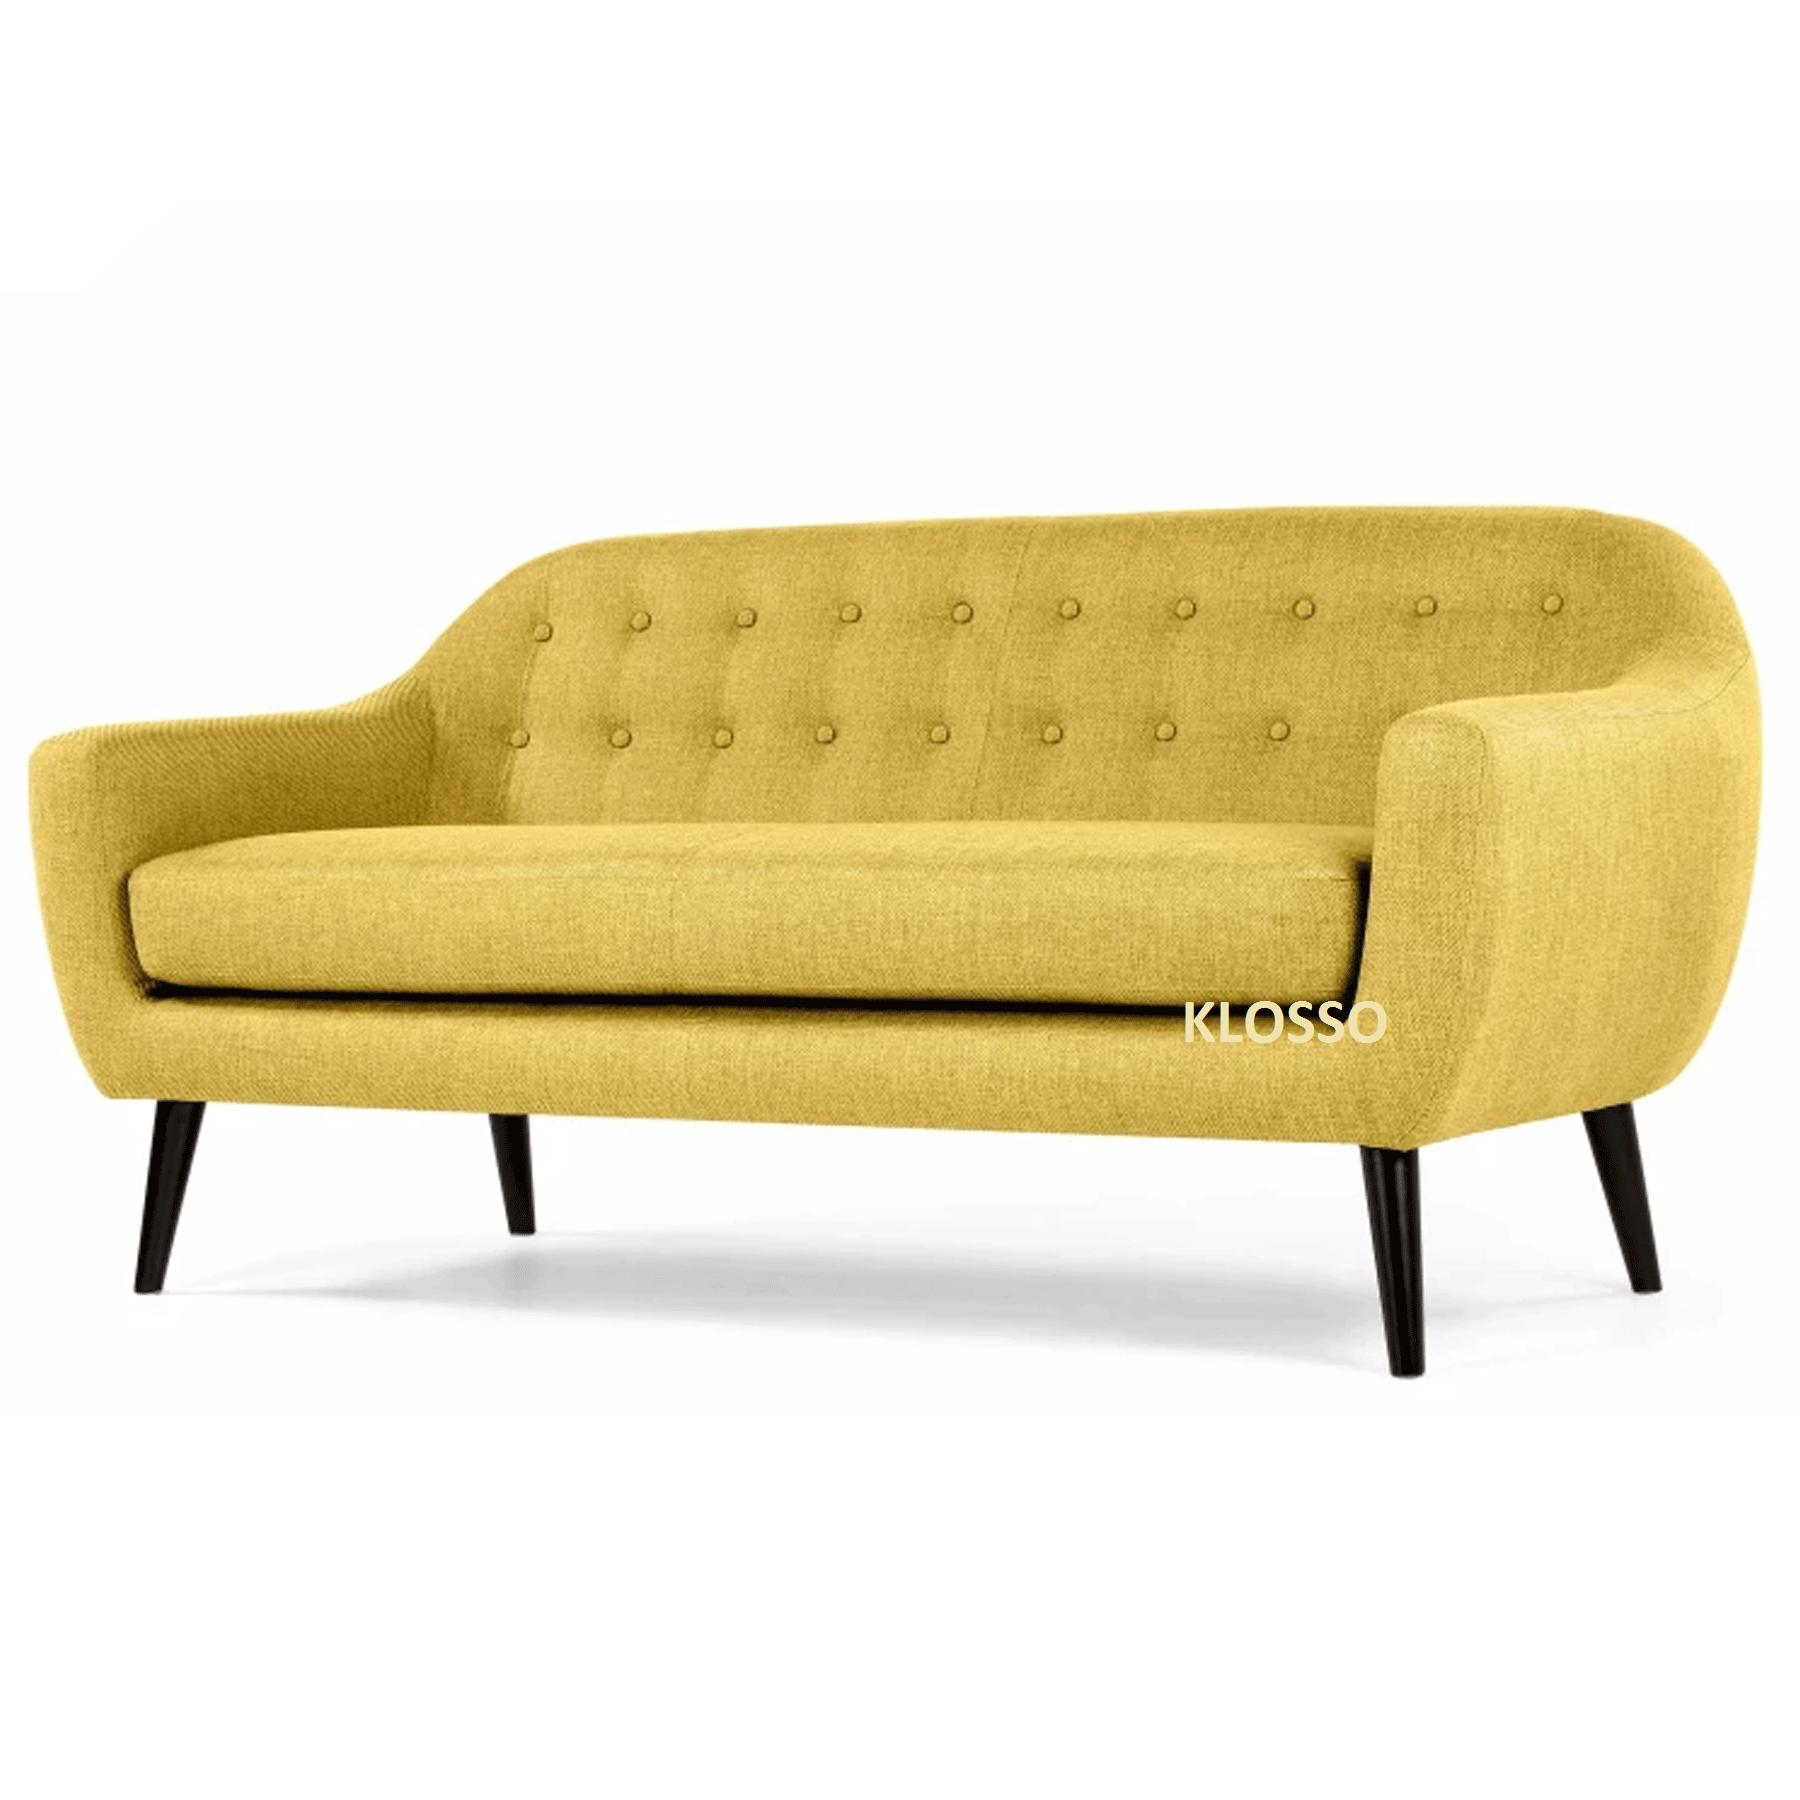 Ghế sofa băng cao cấp Klosso GB004